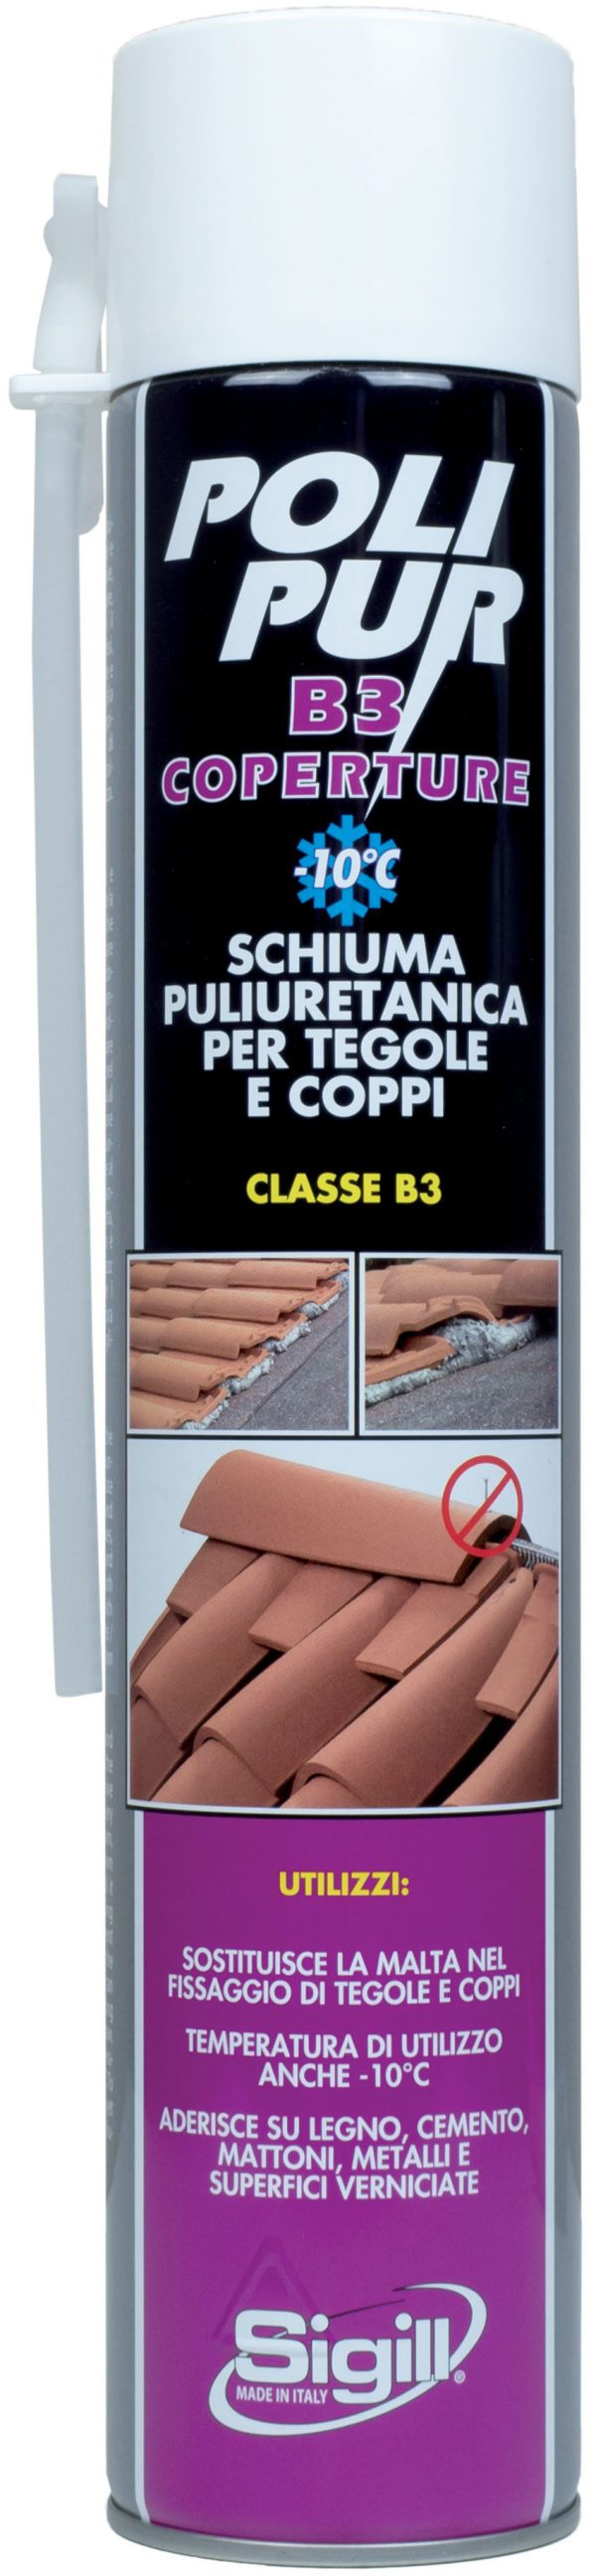 woretproofing construction sealant, POLIPUR B3 COPERTURE MANUALE